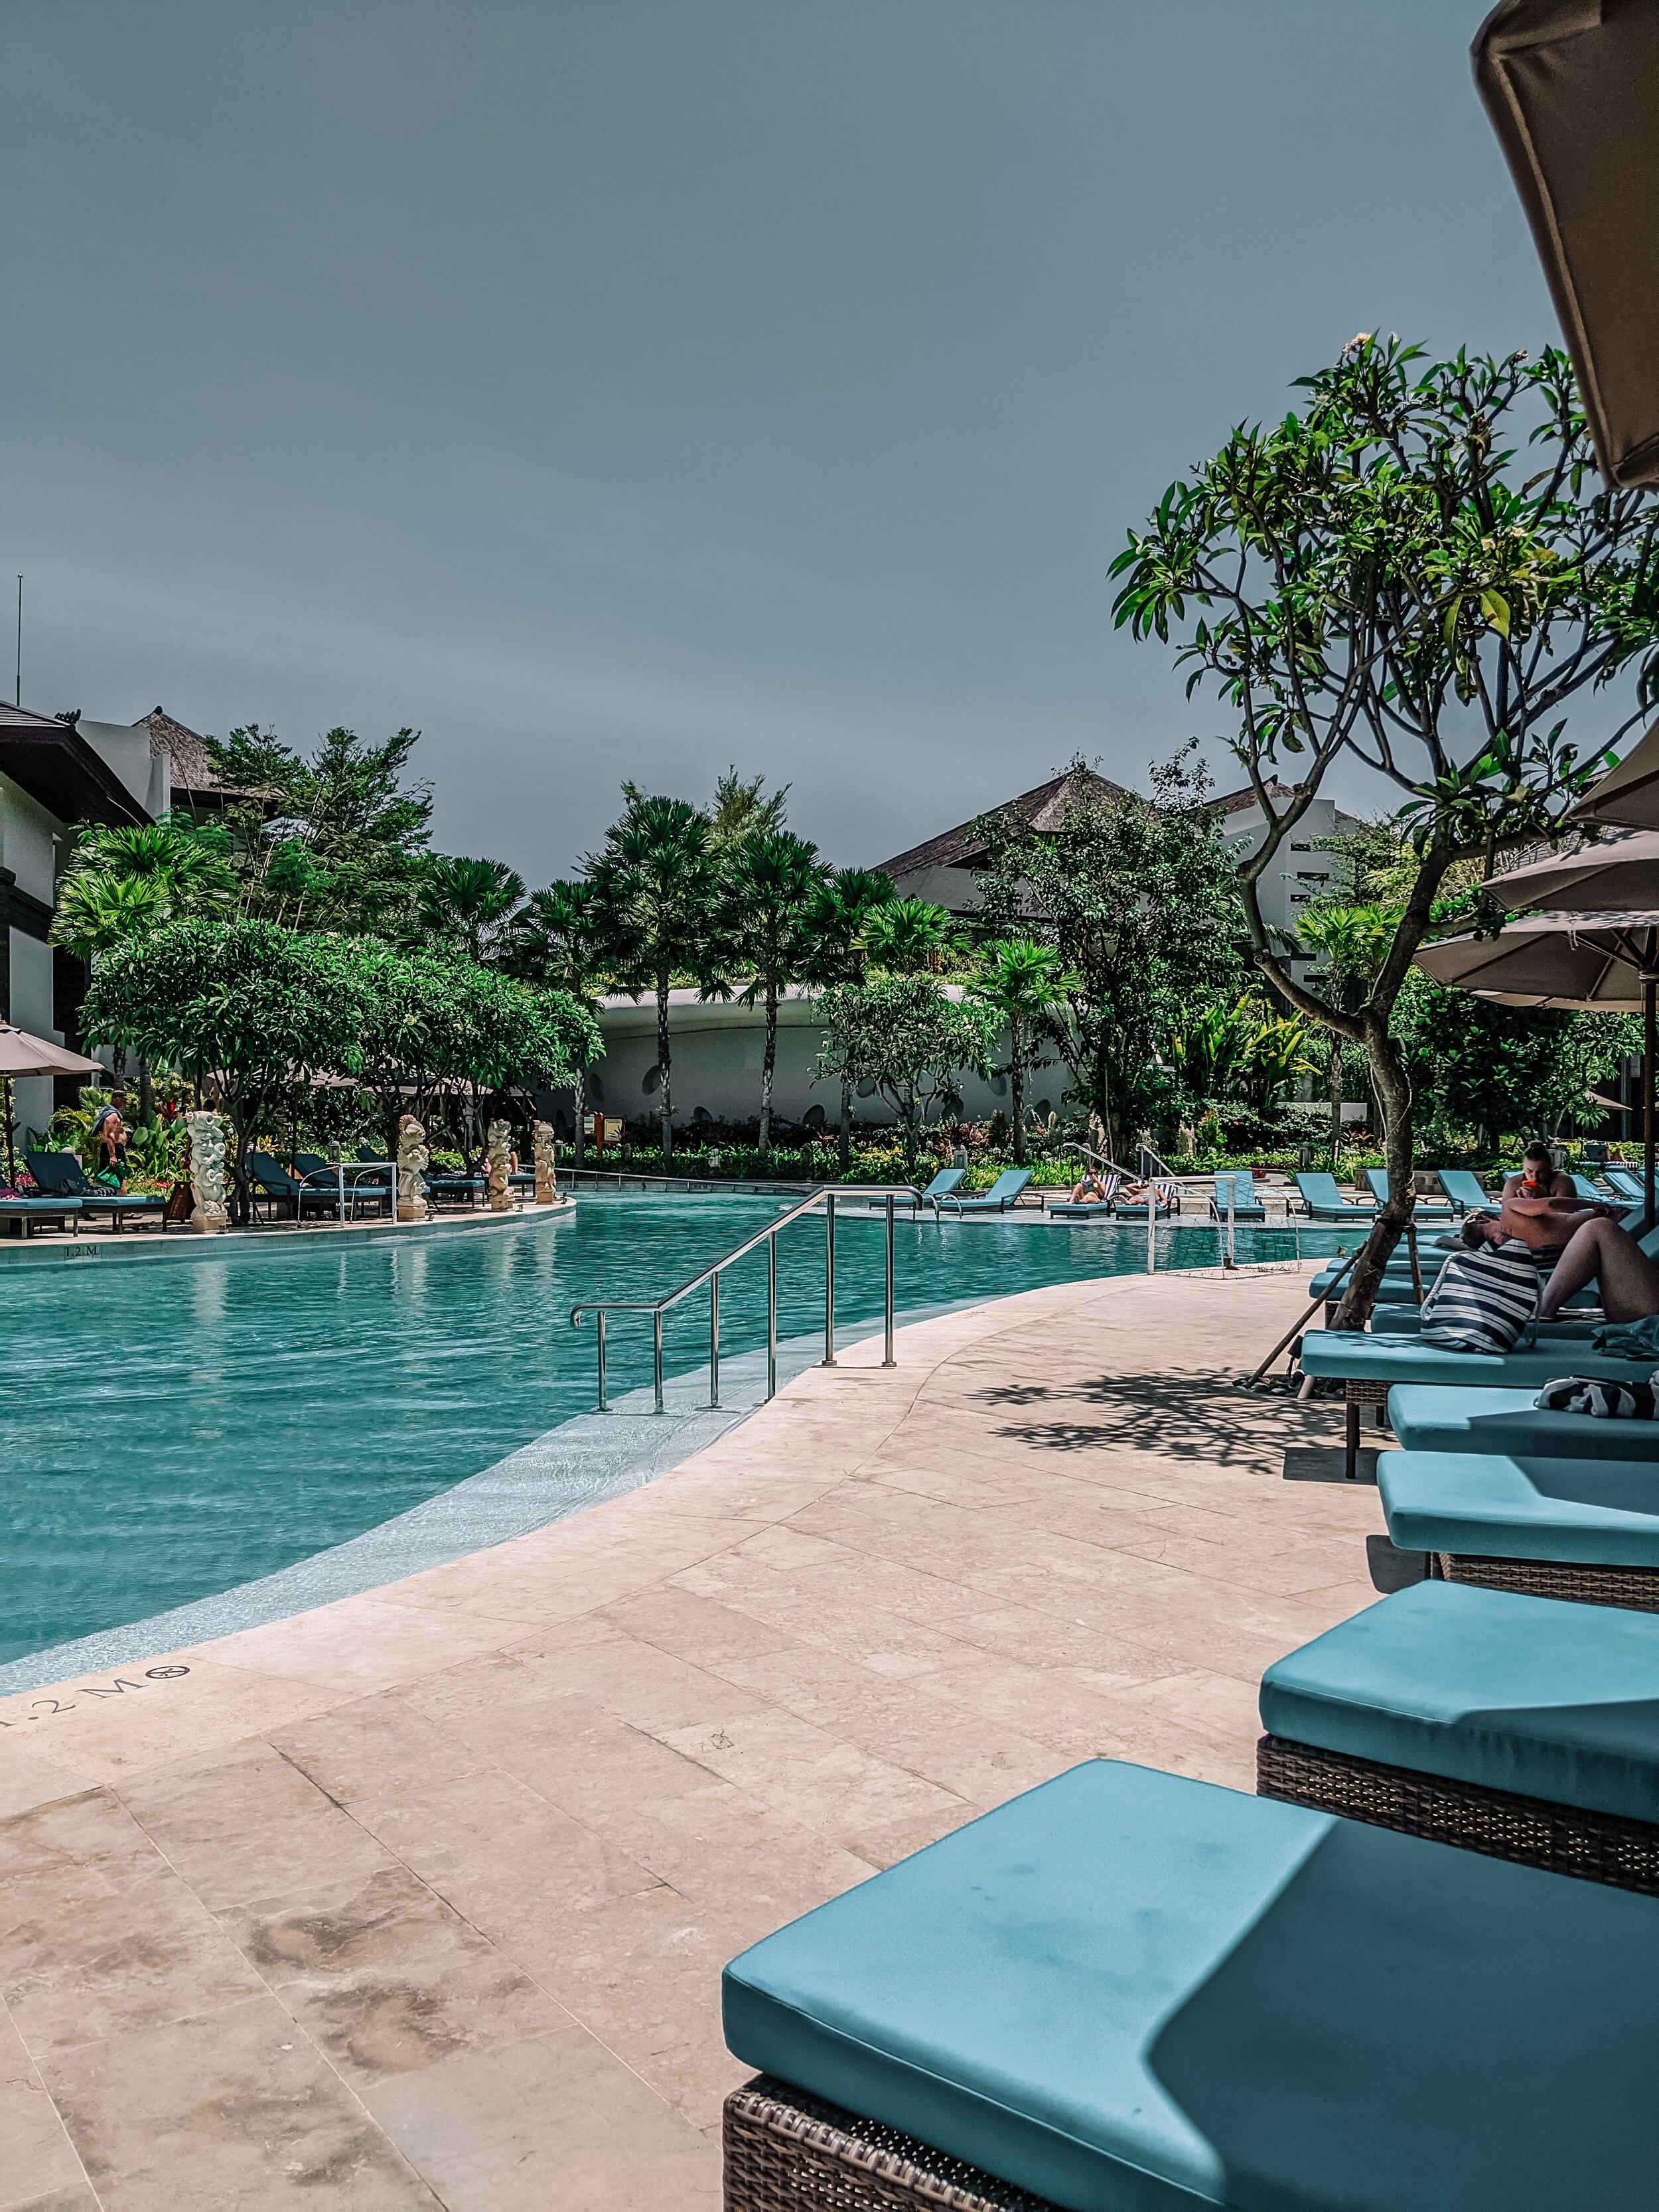 Rachel Off Duty: Marriott's Bali Nusa Dua Gardens